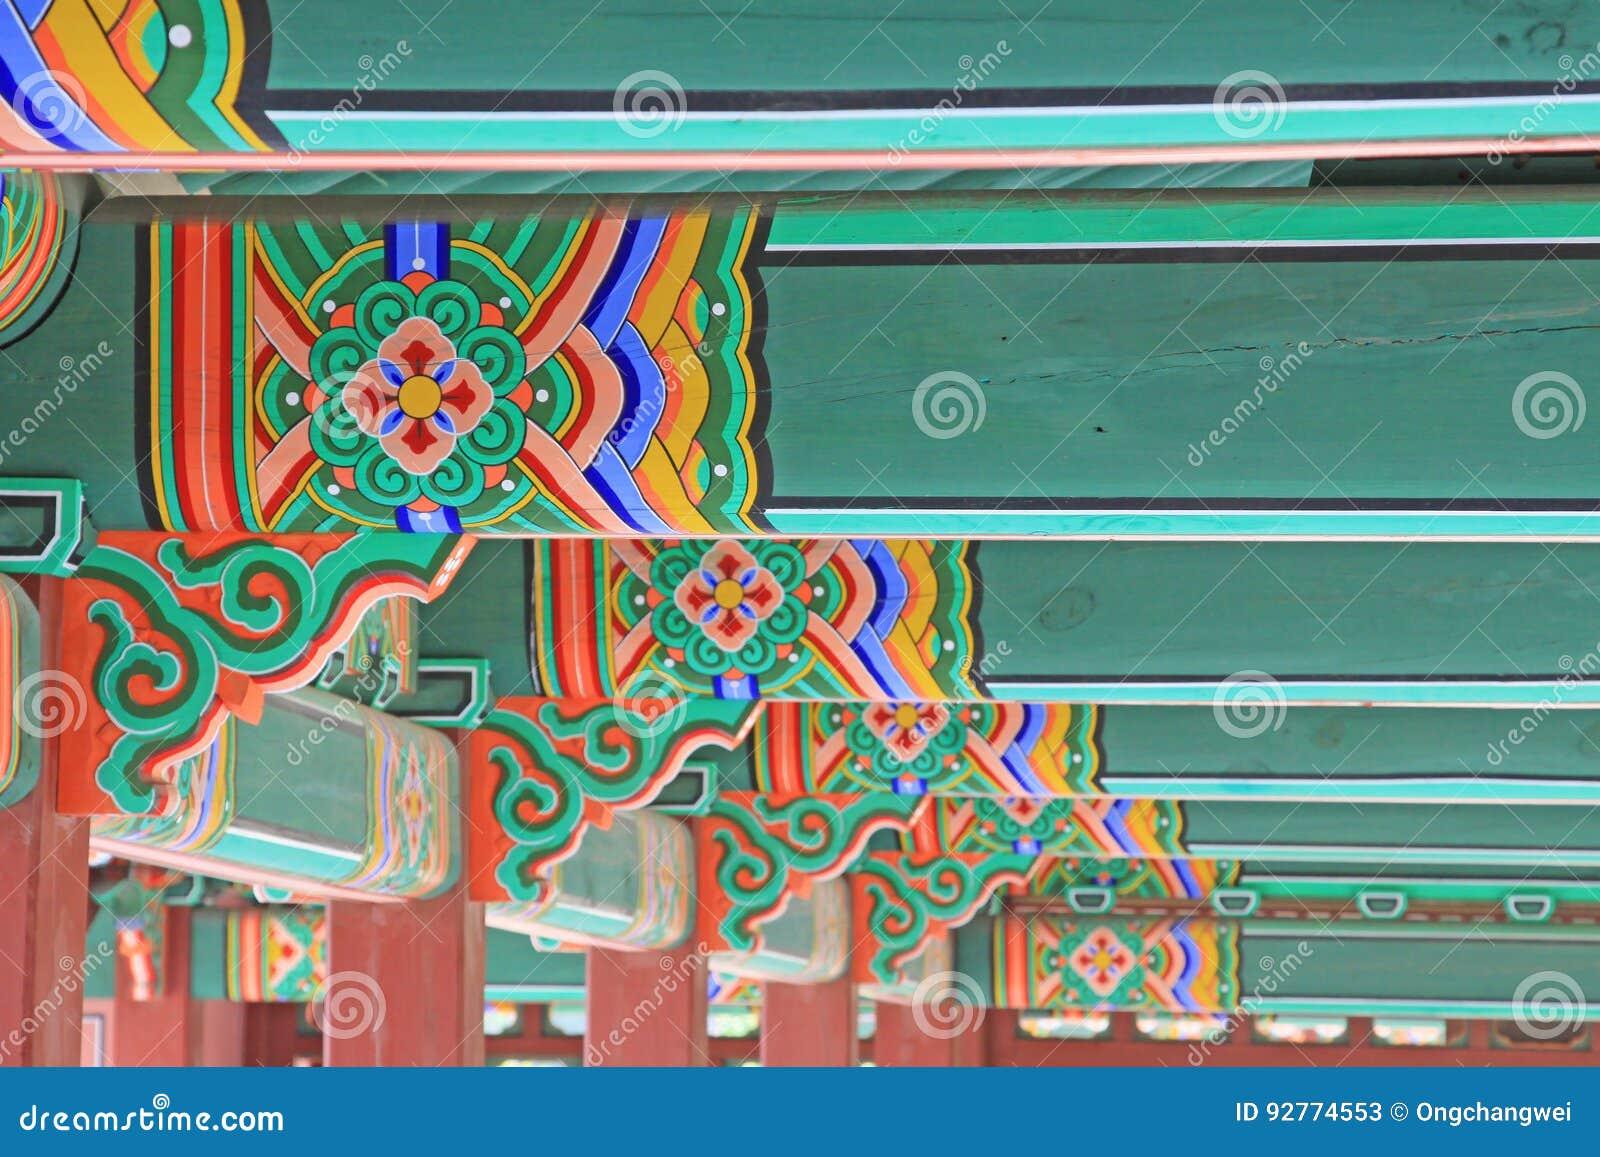 Korea-Dachbalken-hölzerne Malerei